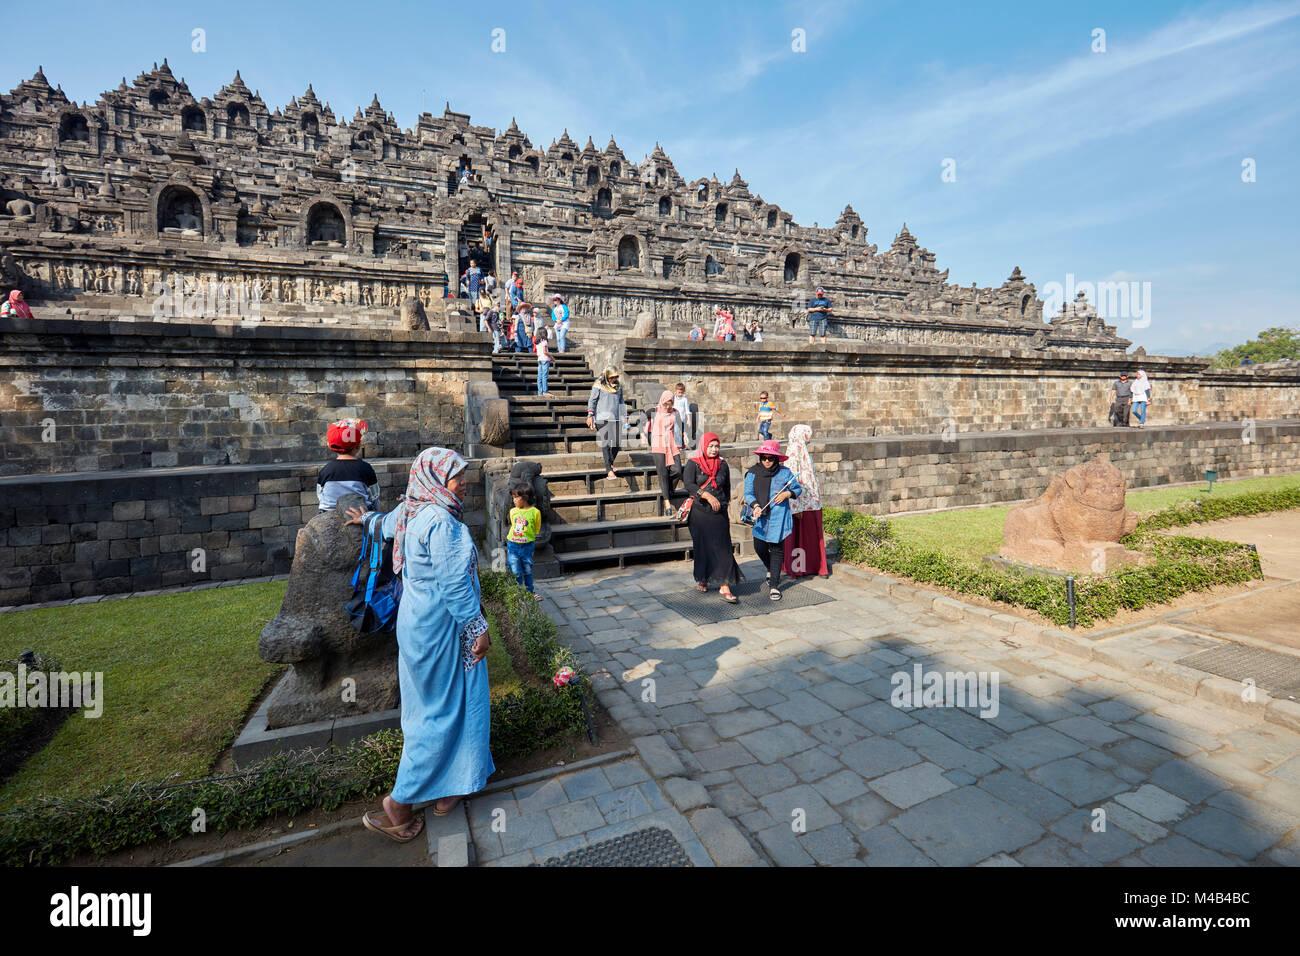 I turisti sulla strada fuori dal Borobudur tempio buddista. Magelang Regency, Java, Indonesia. Immagini Stock